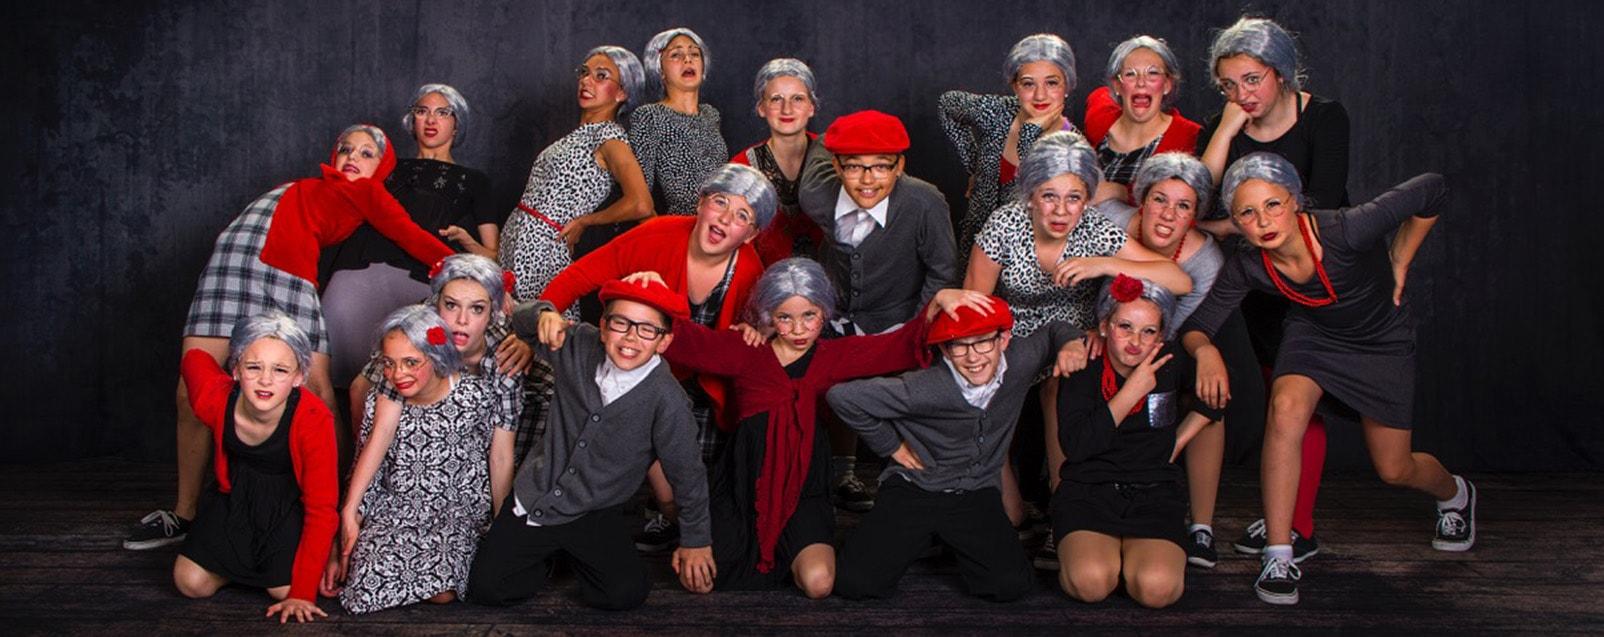 core dance group